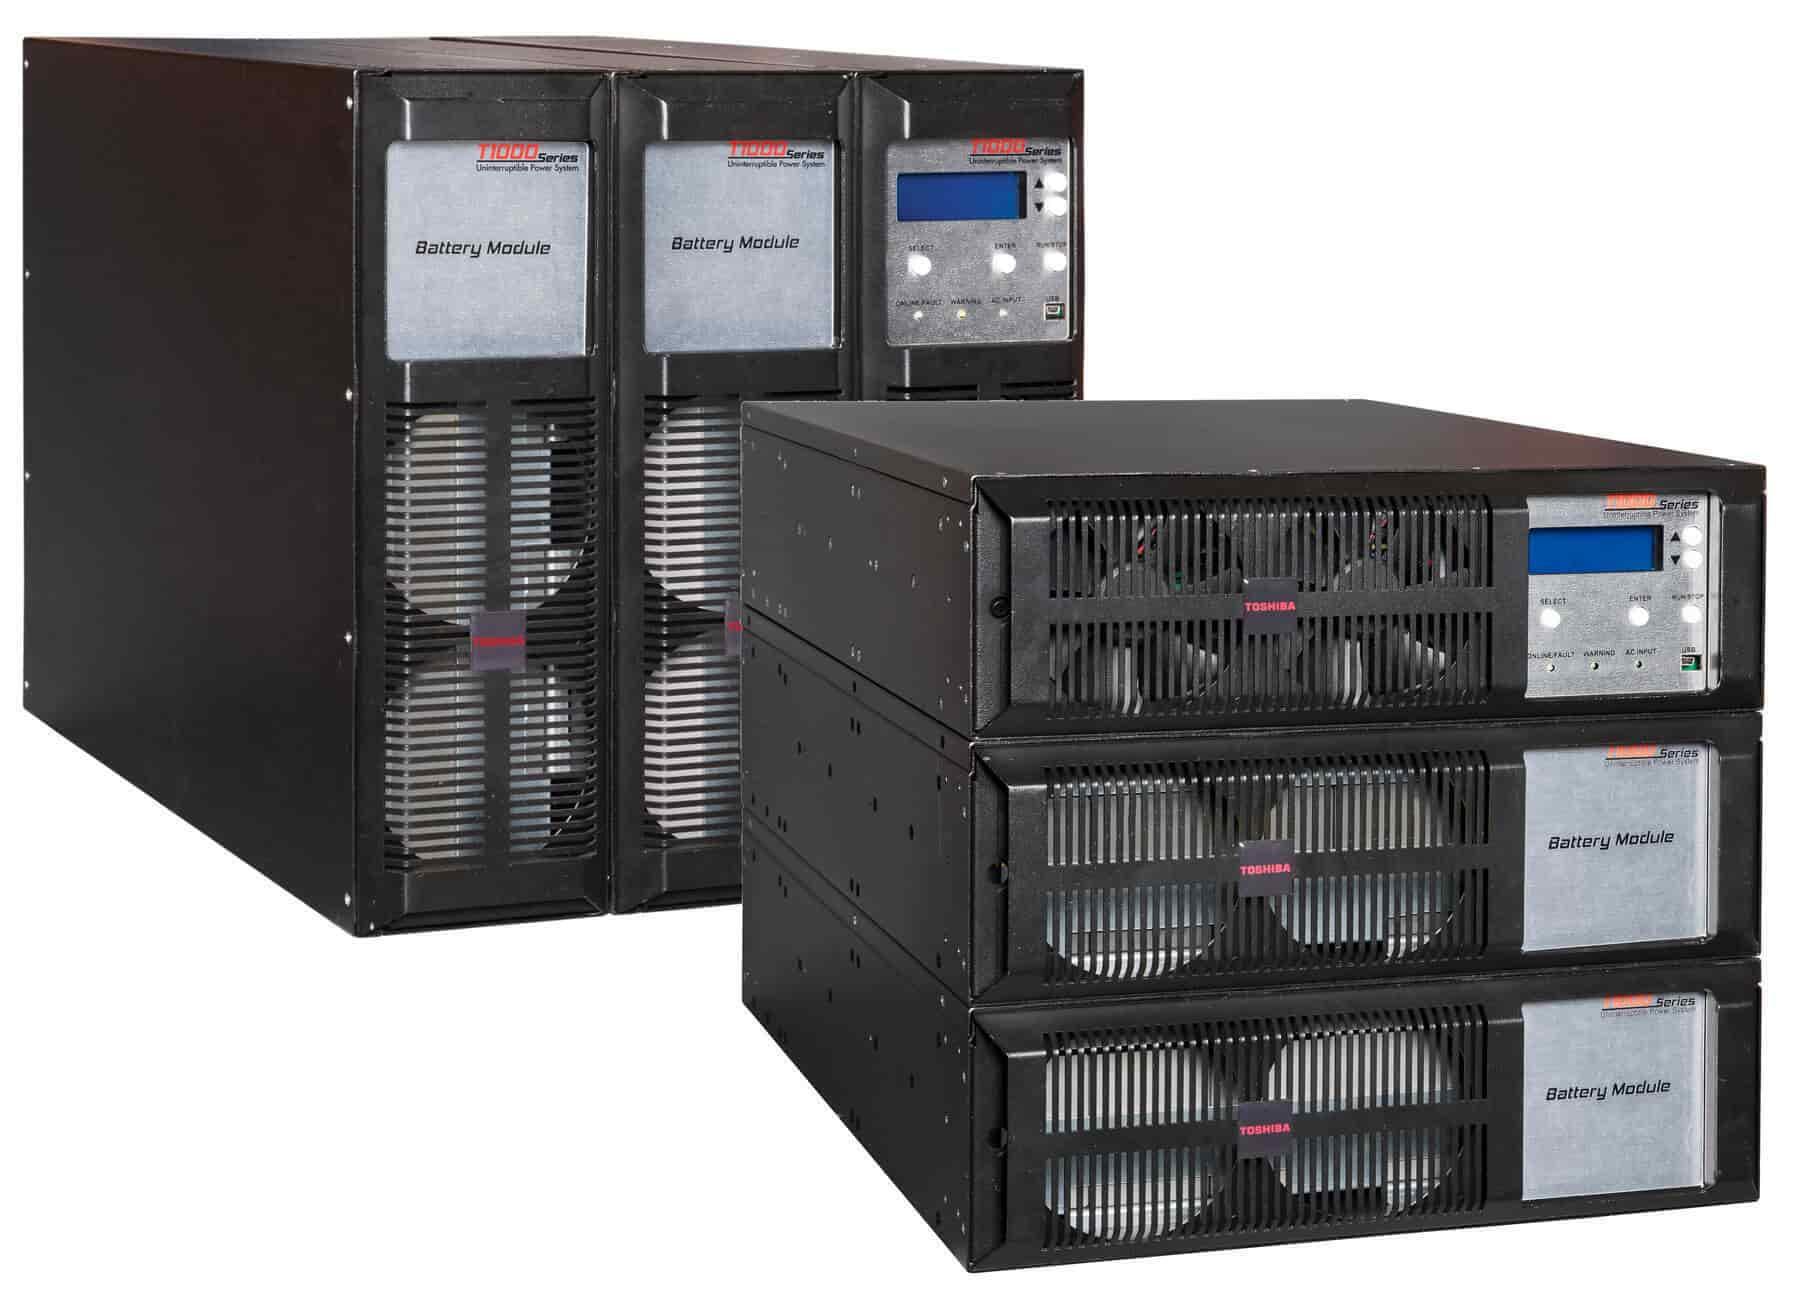 T1000 Series UPS 1-6kVA